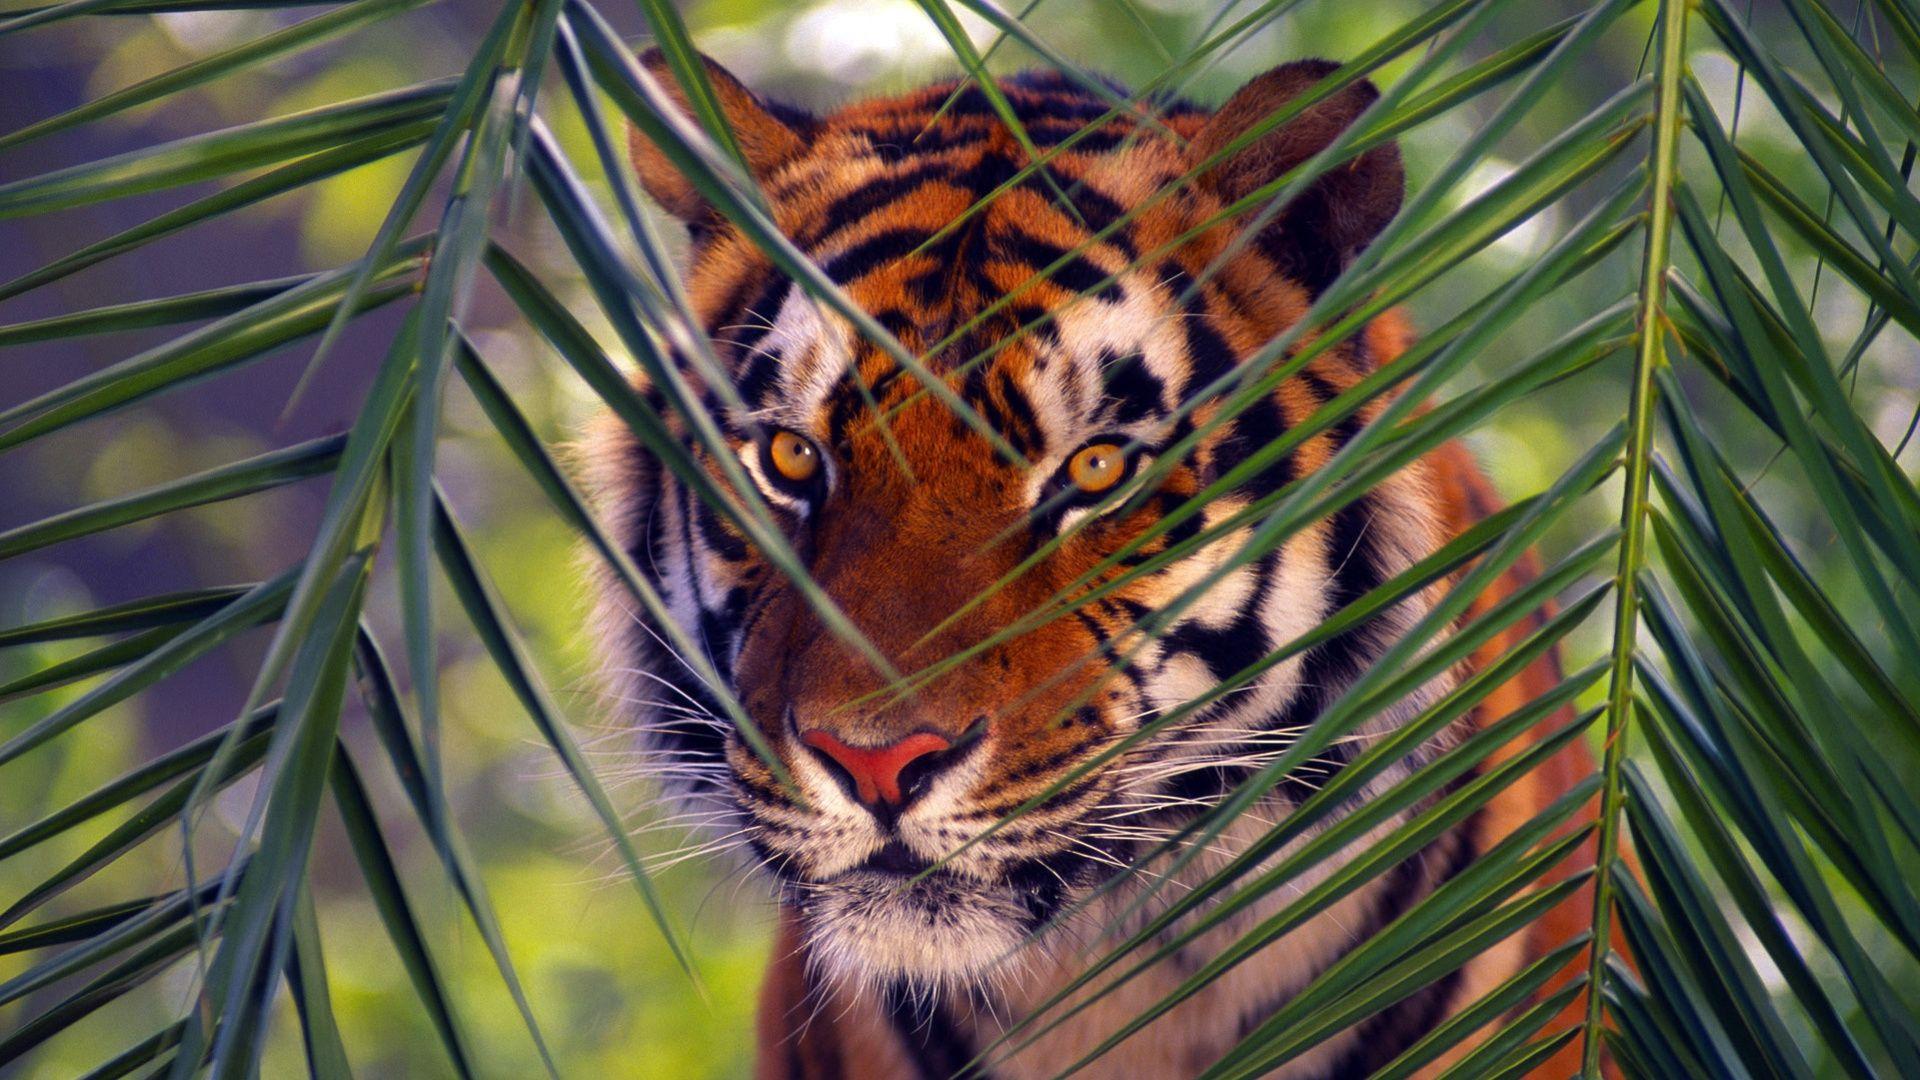 Tiger hid, Free Download Wallpaper